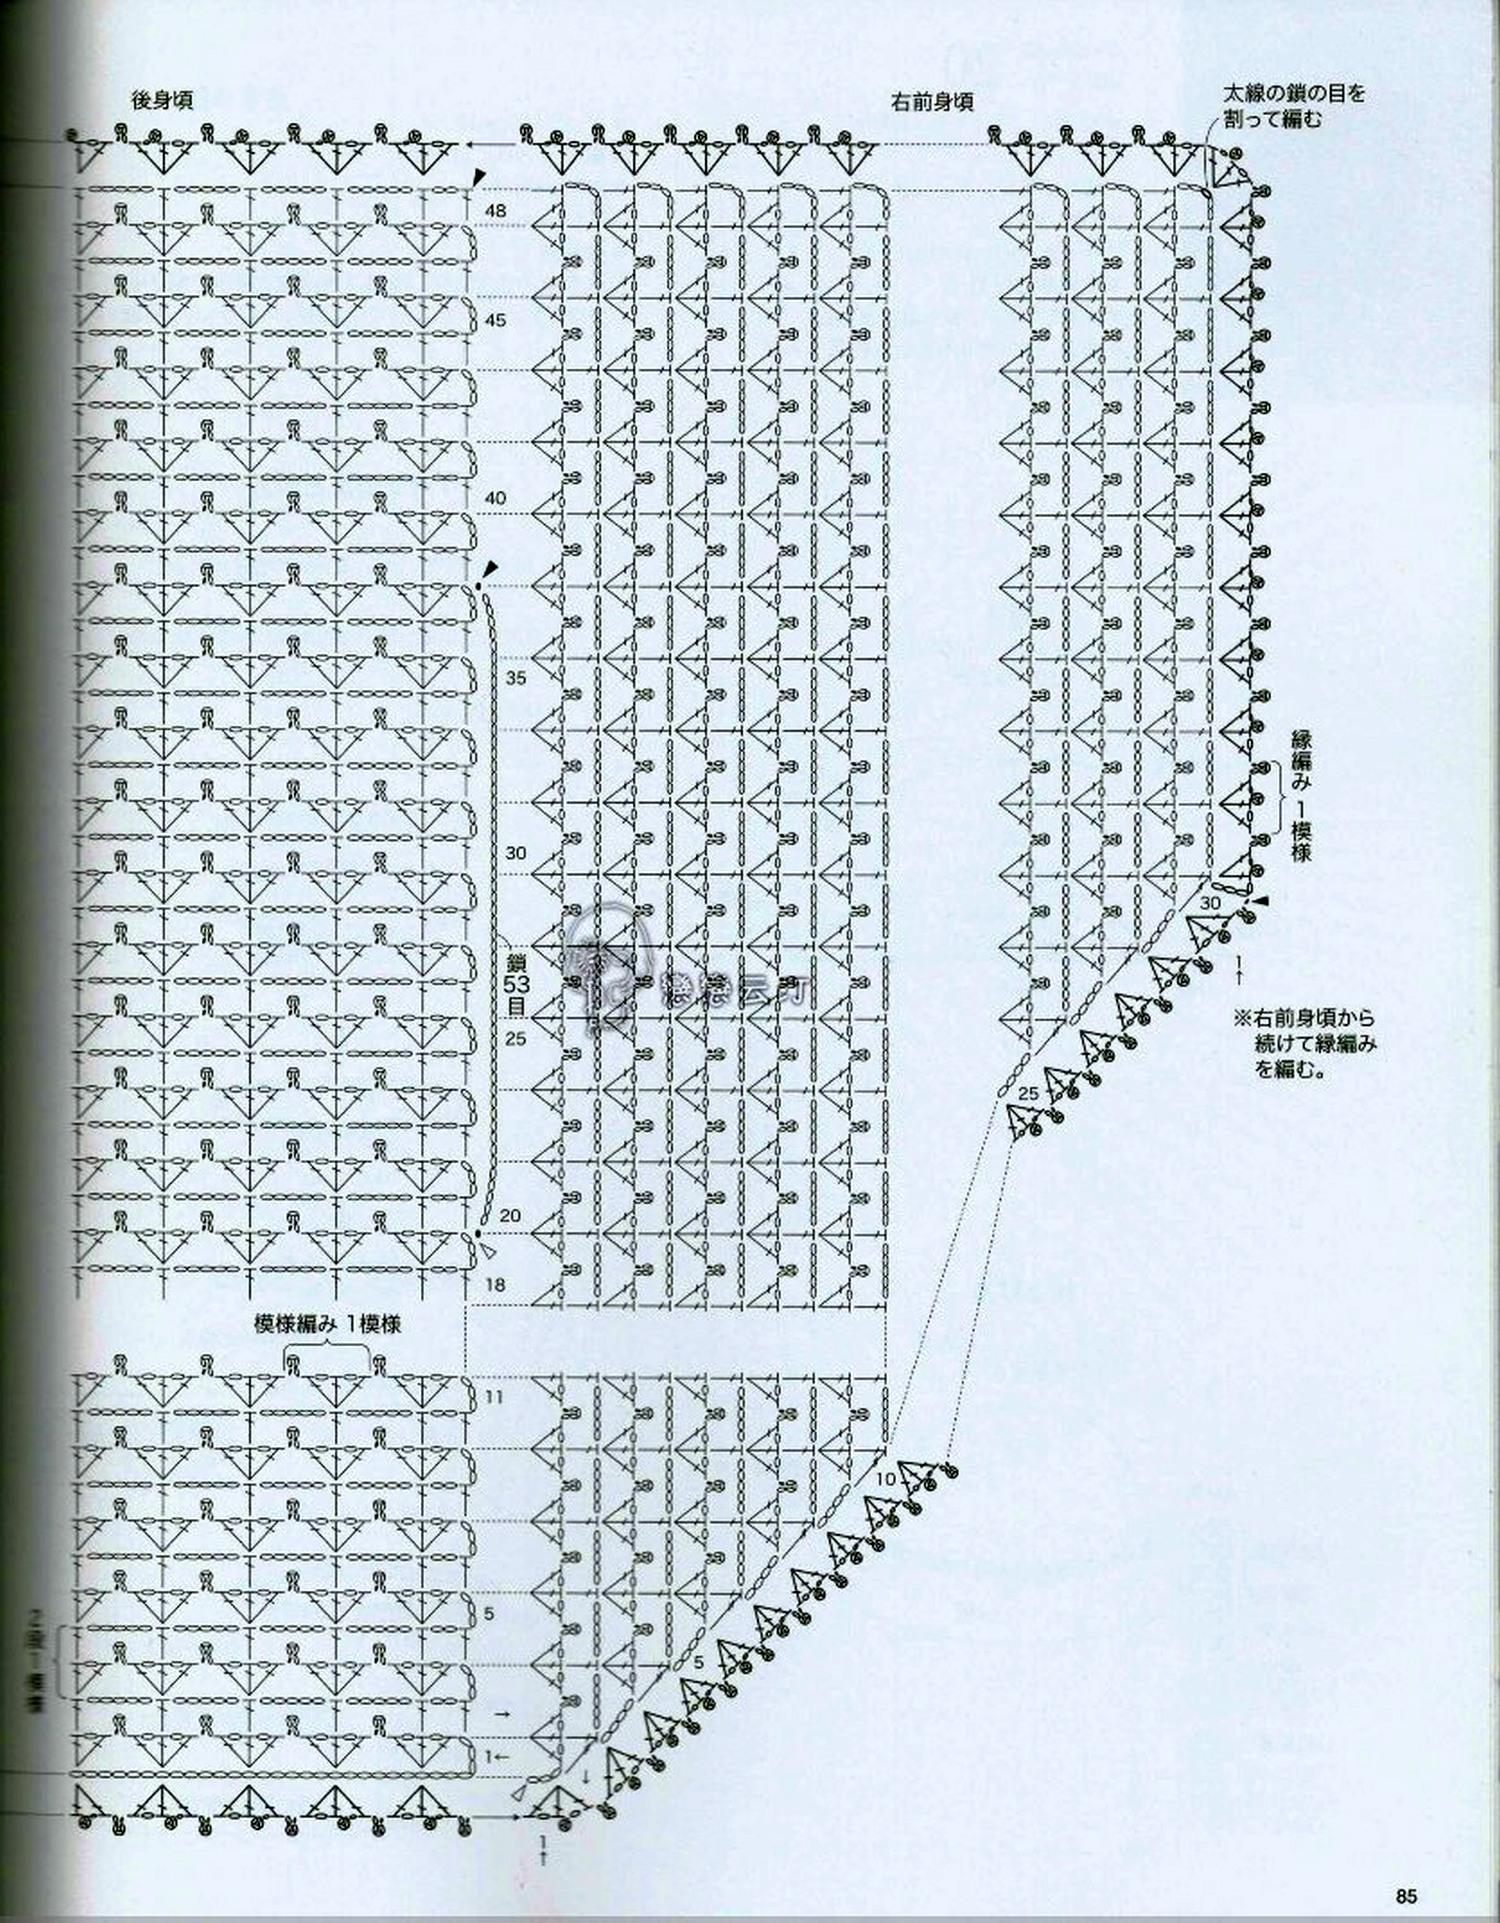 0991_4160vzLBs16 (25)